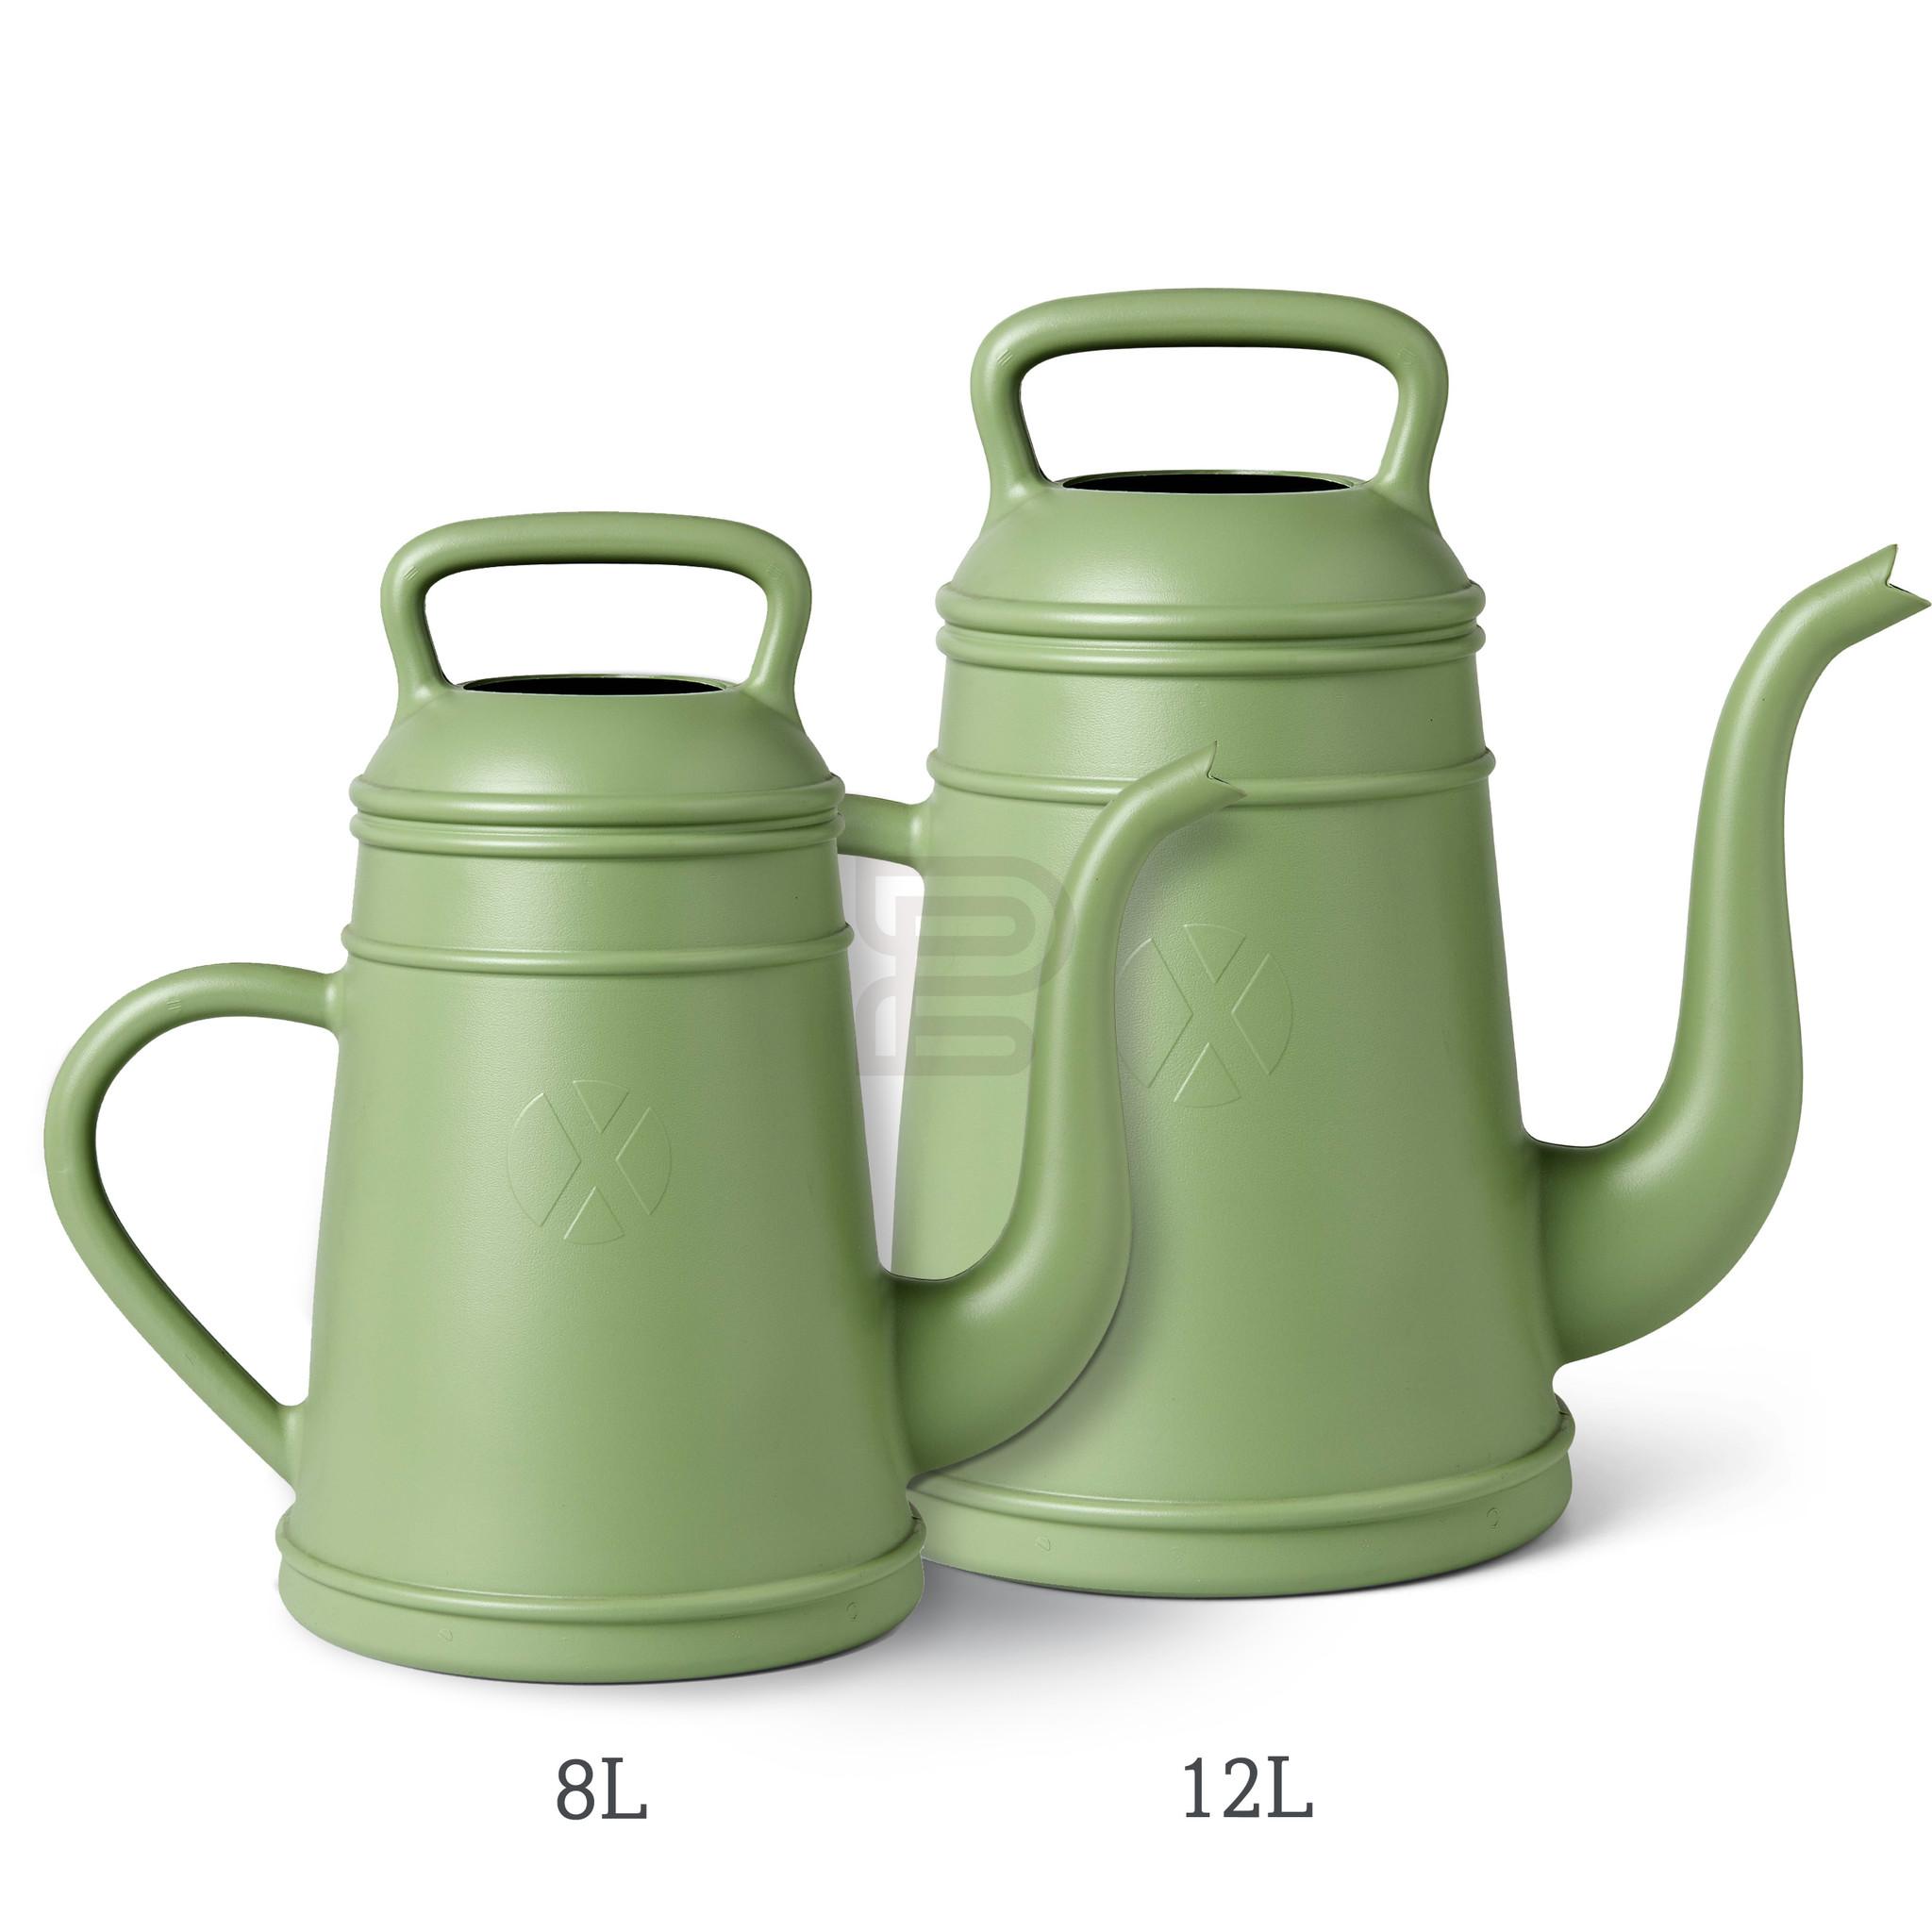 Xala Xala Gieter Lungo Old Green - Gieter groen 8 & 12  Liter